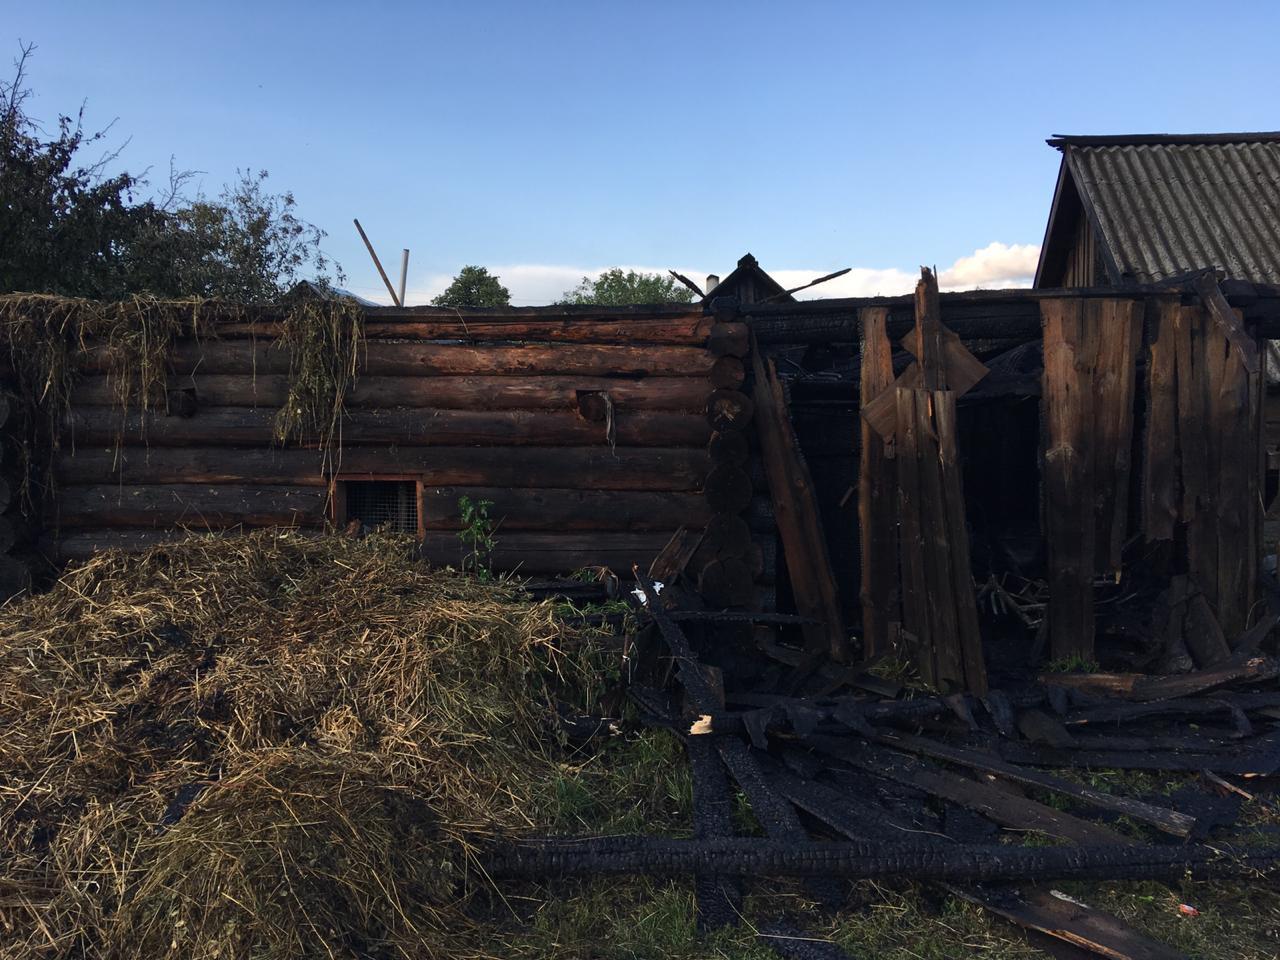 В Марий Эл трое дошколят спалили сарай